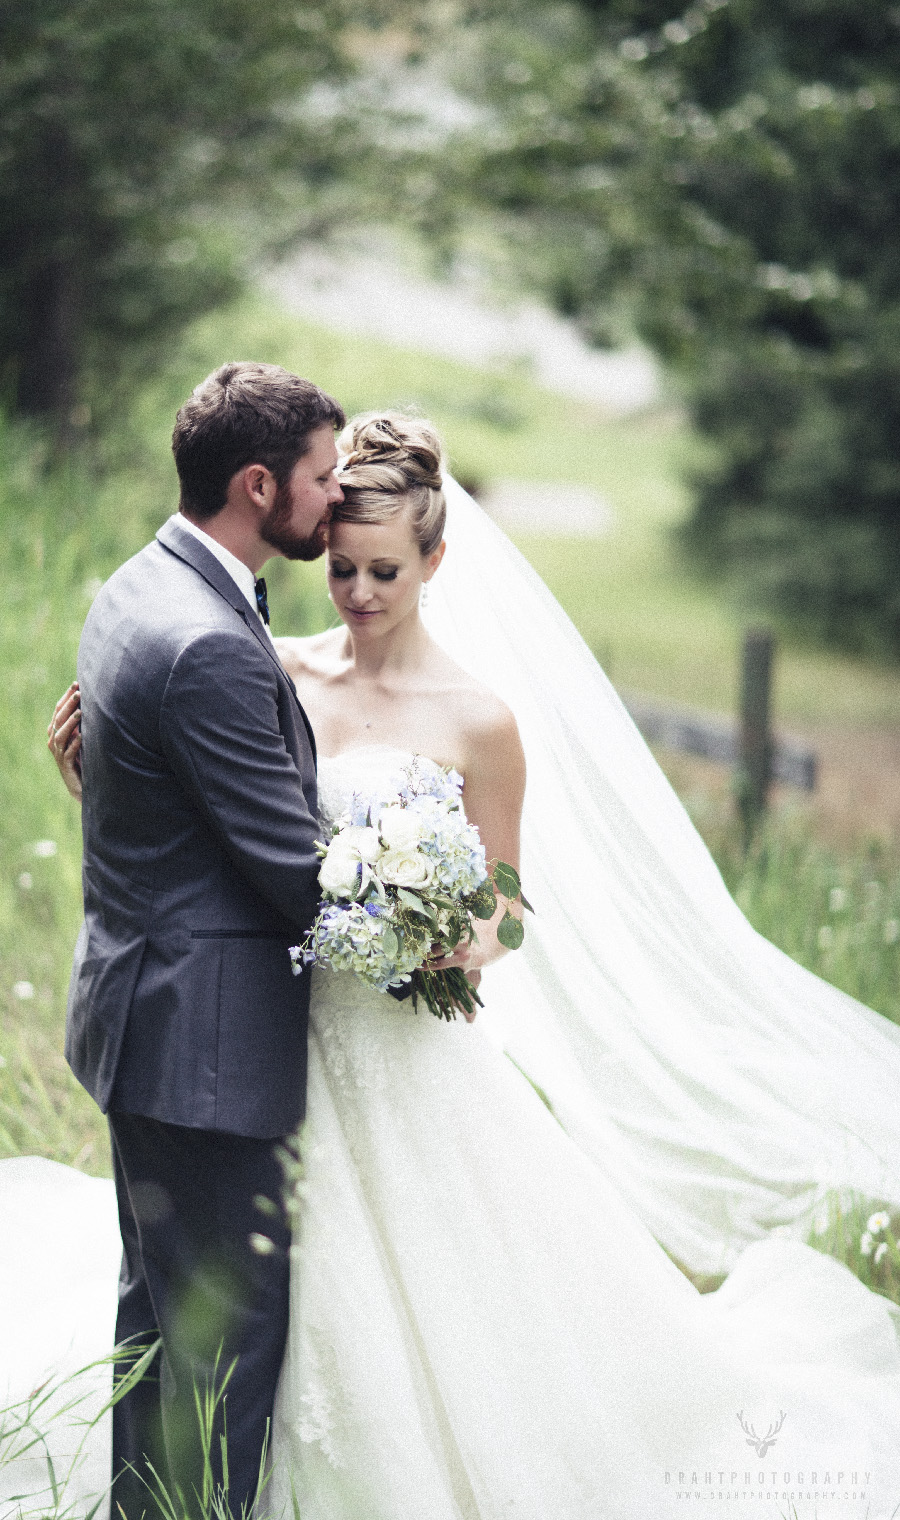 Coldstream Silver Sage Stables Wedding Photographer By Draht Photography Draht Photography